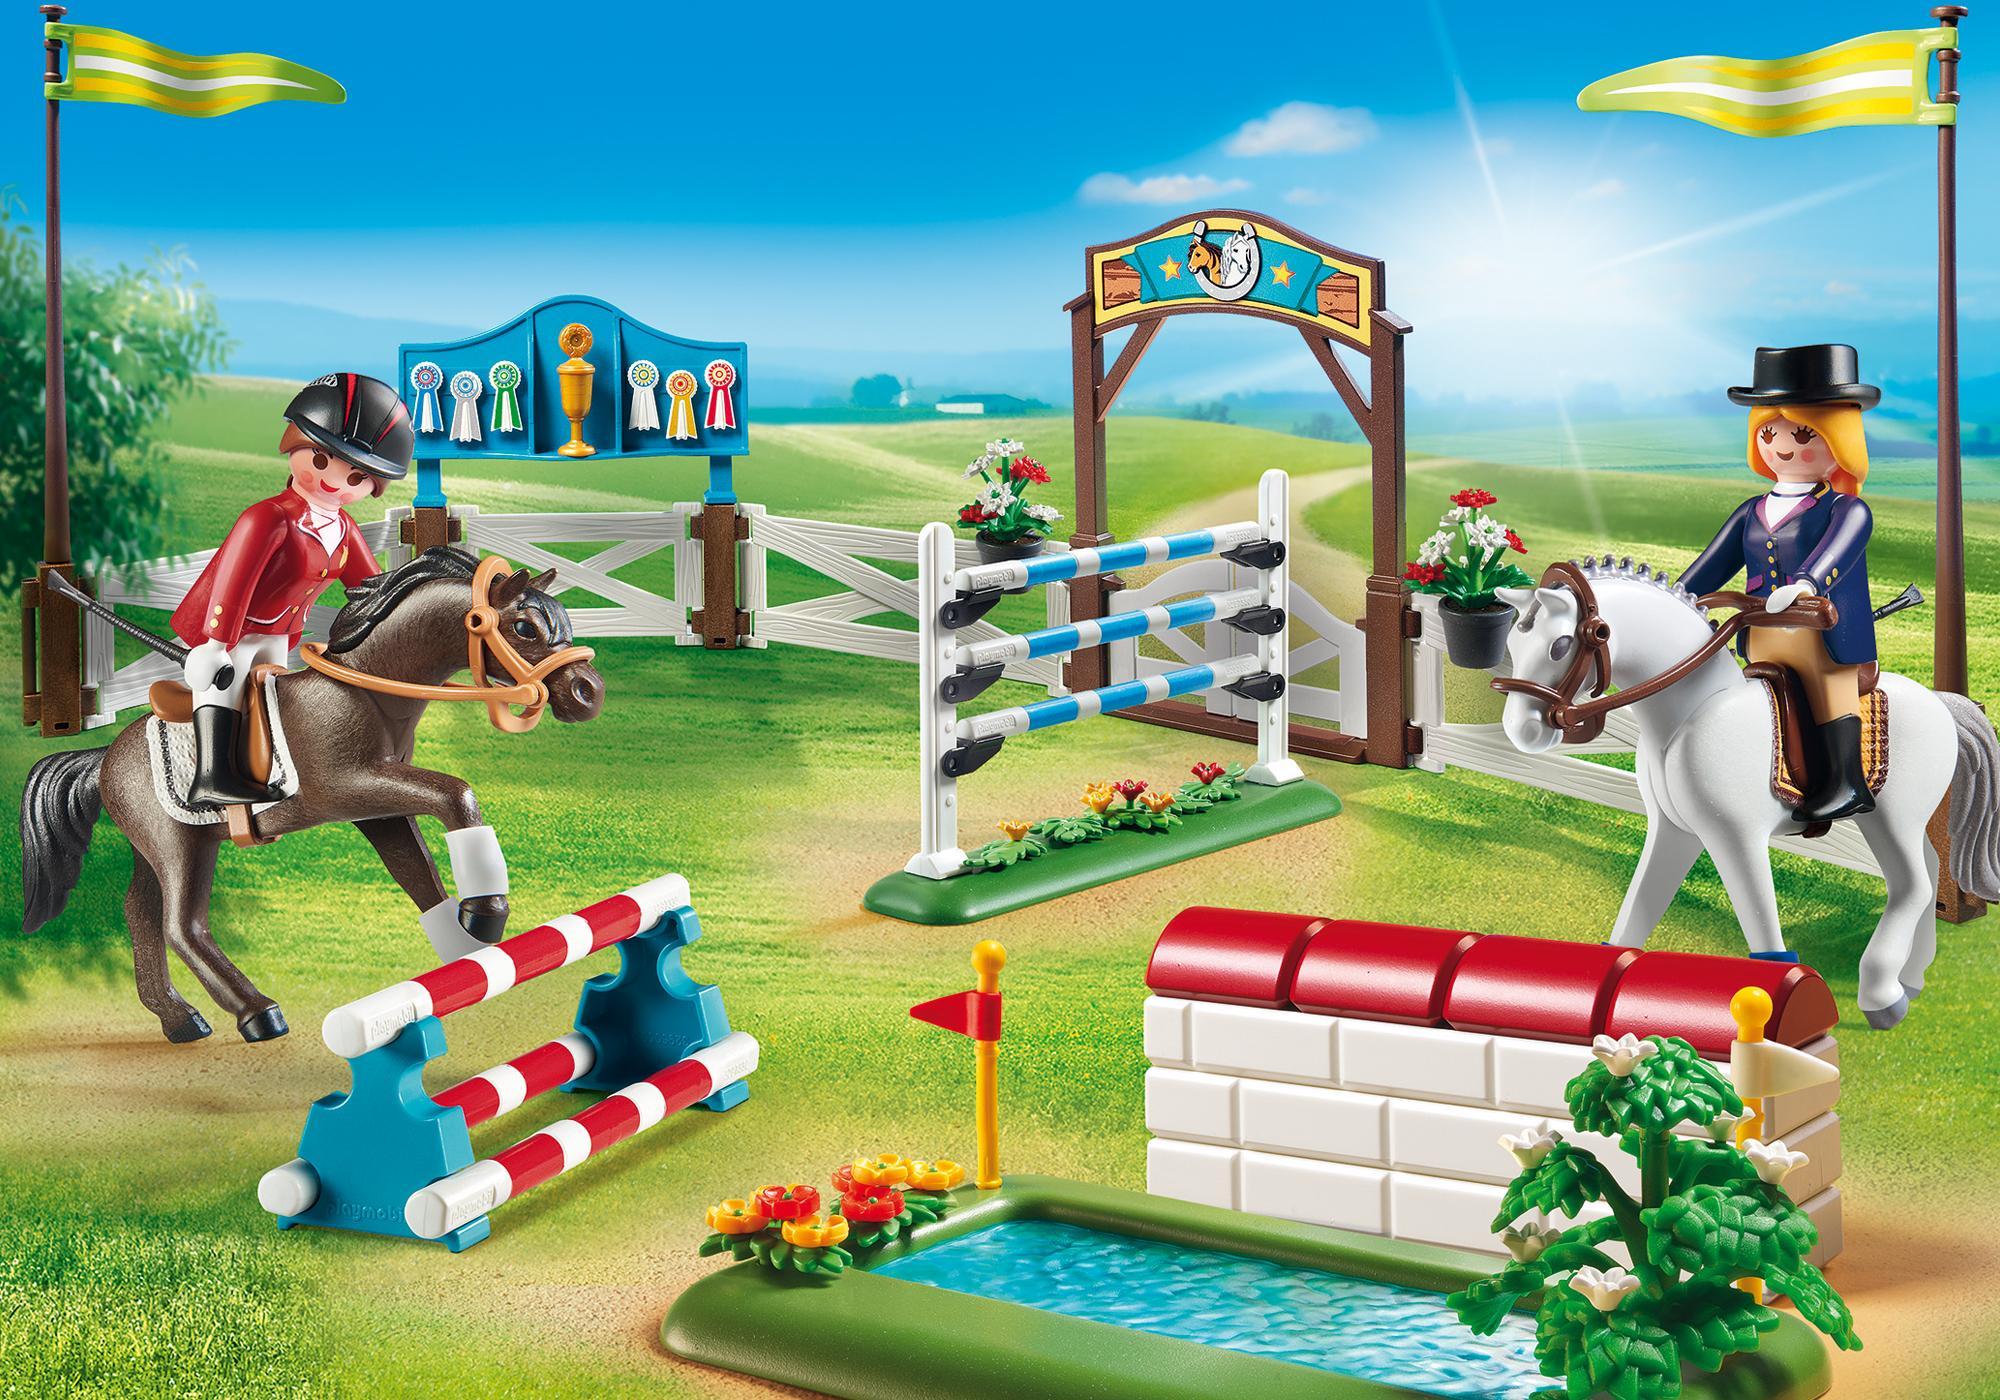 http://media.playmobil.com/i/playmobil/6930_product_detail/Paardenwedstrijd